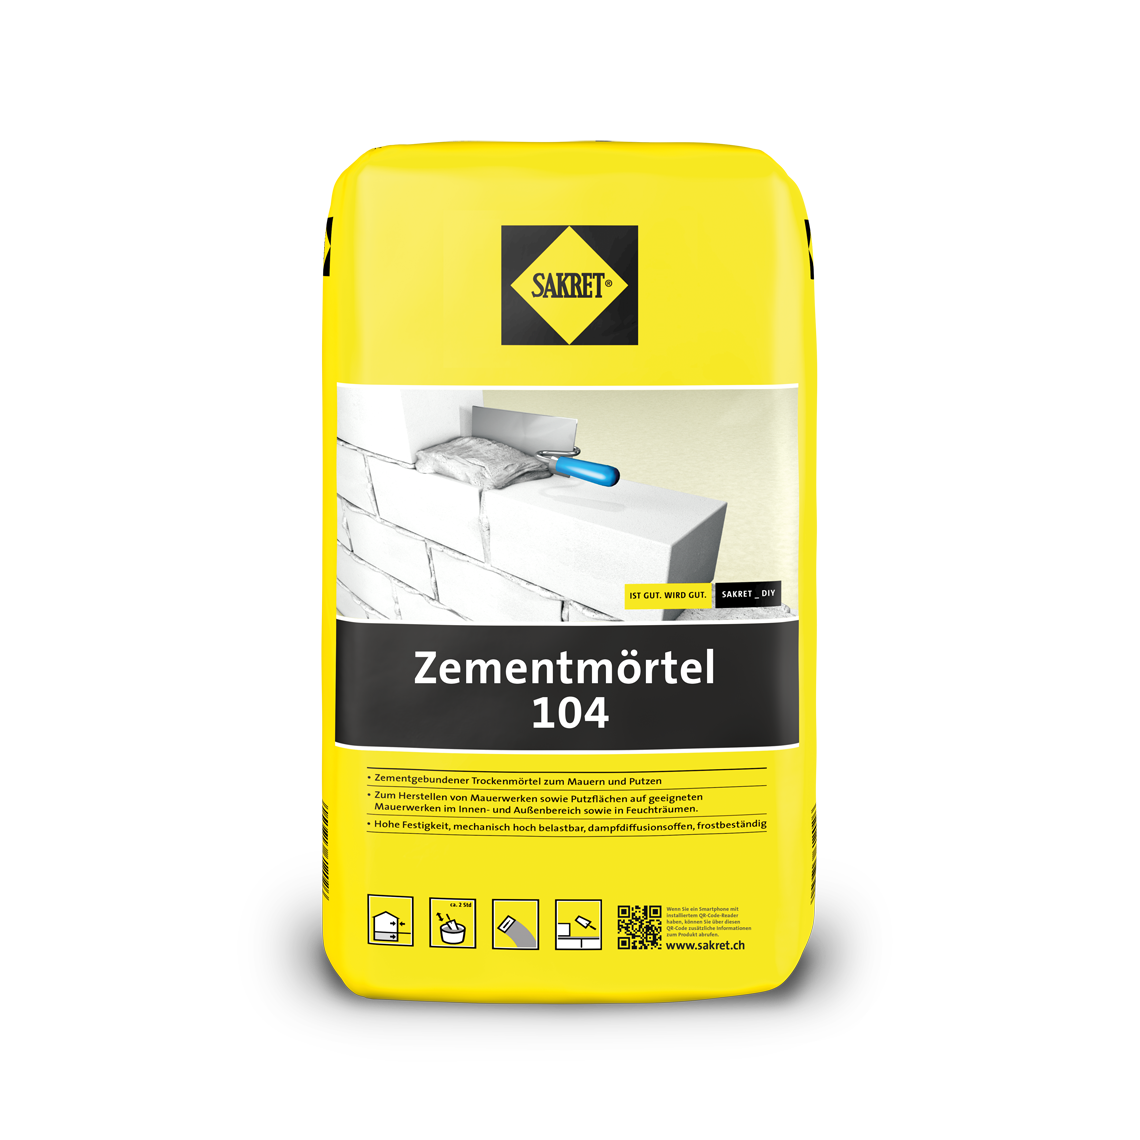 SAKRET Zementmörtel